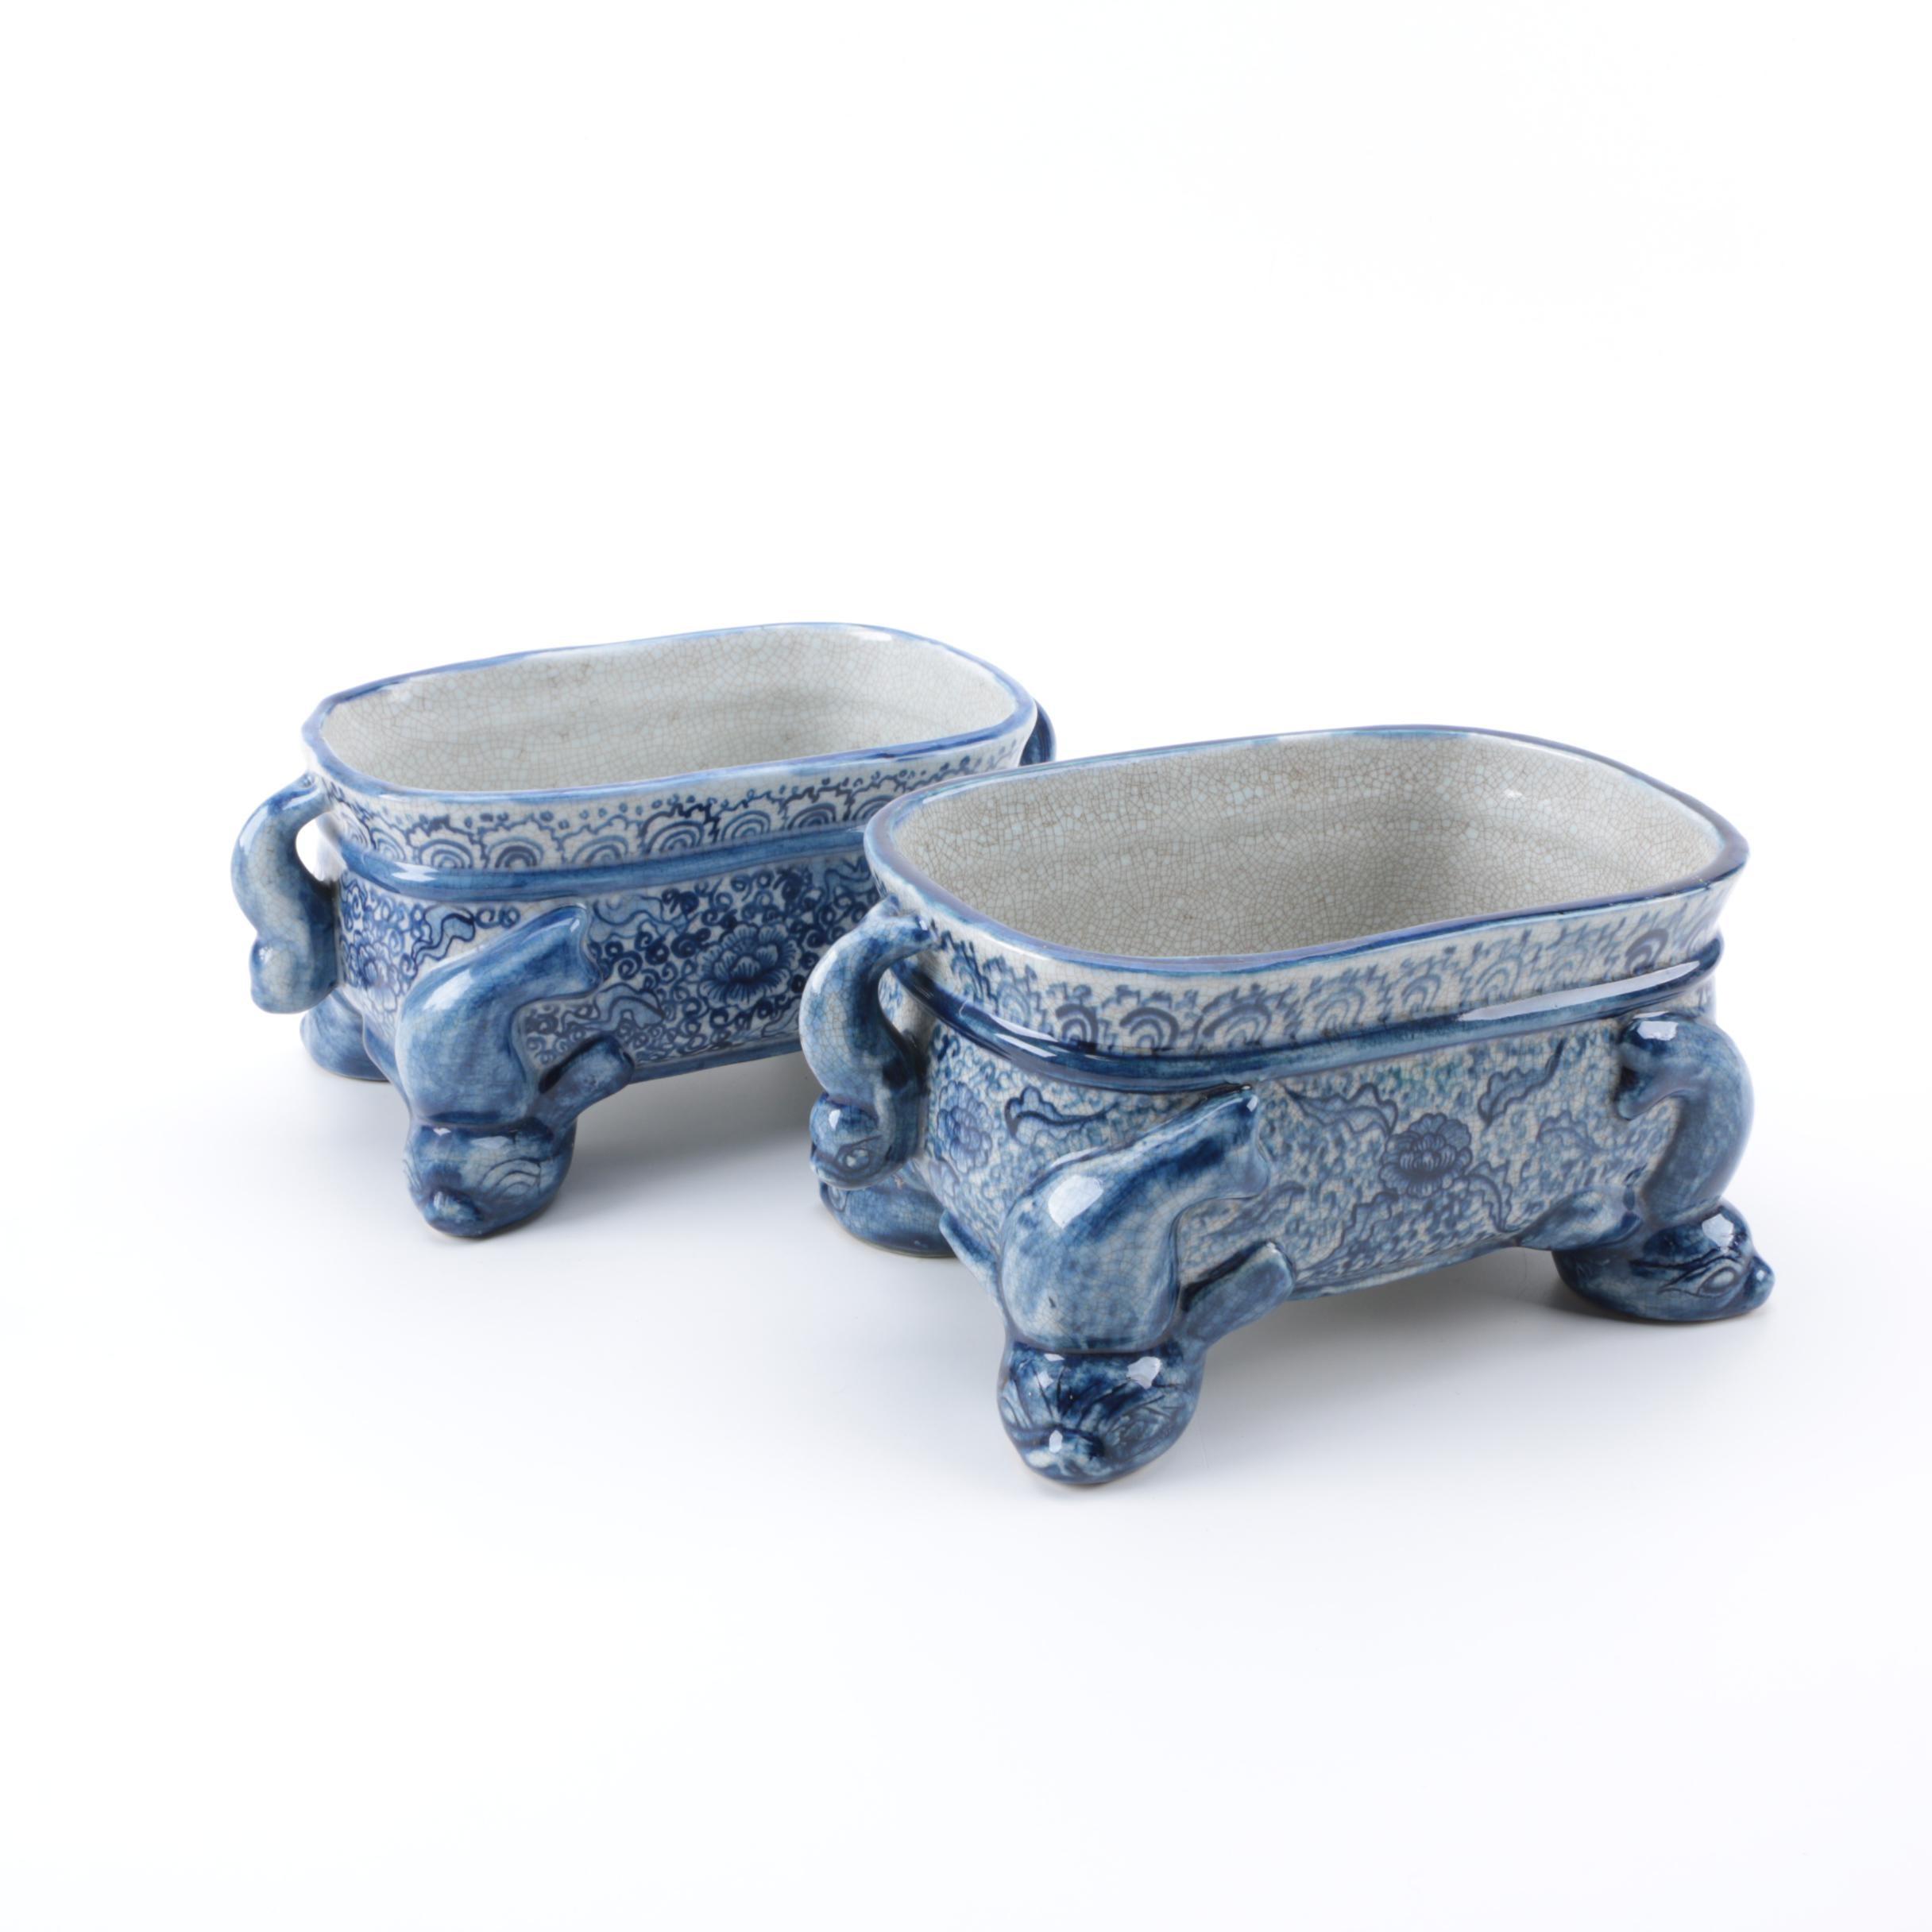 Pair Vintage Blue and White Porcelain Planters